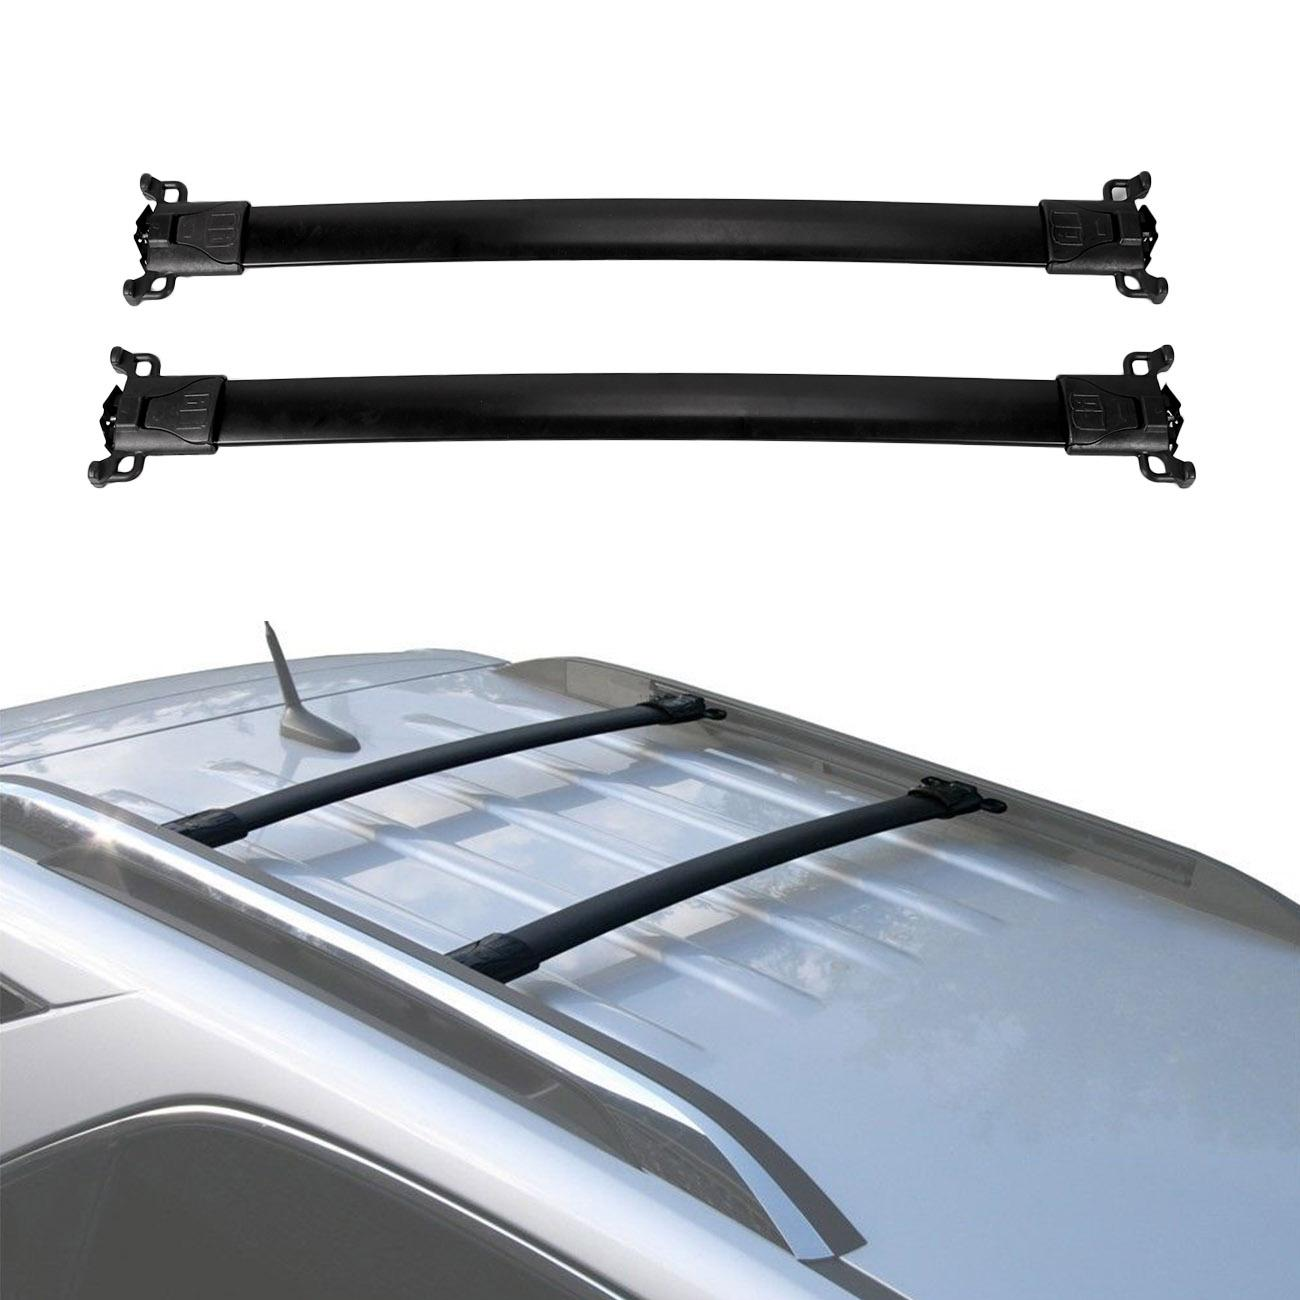 FOR 10-17 CHEVY EQUINOX//GMC TERRAIN OE ROOF RACK RAIL CROSS BAR LUGGAGE CARRIER